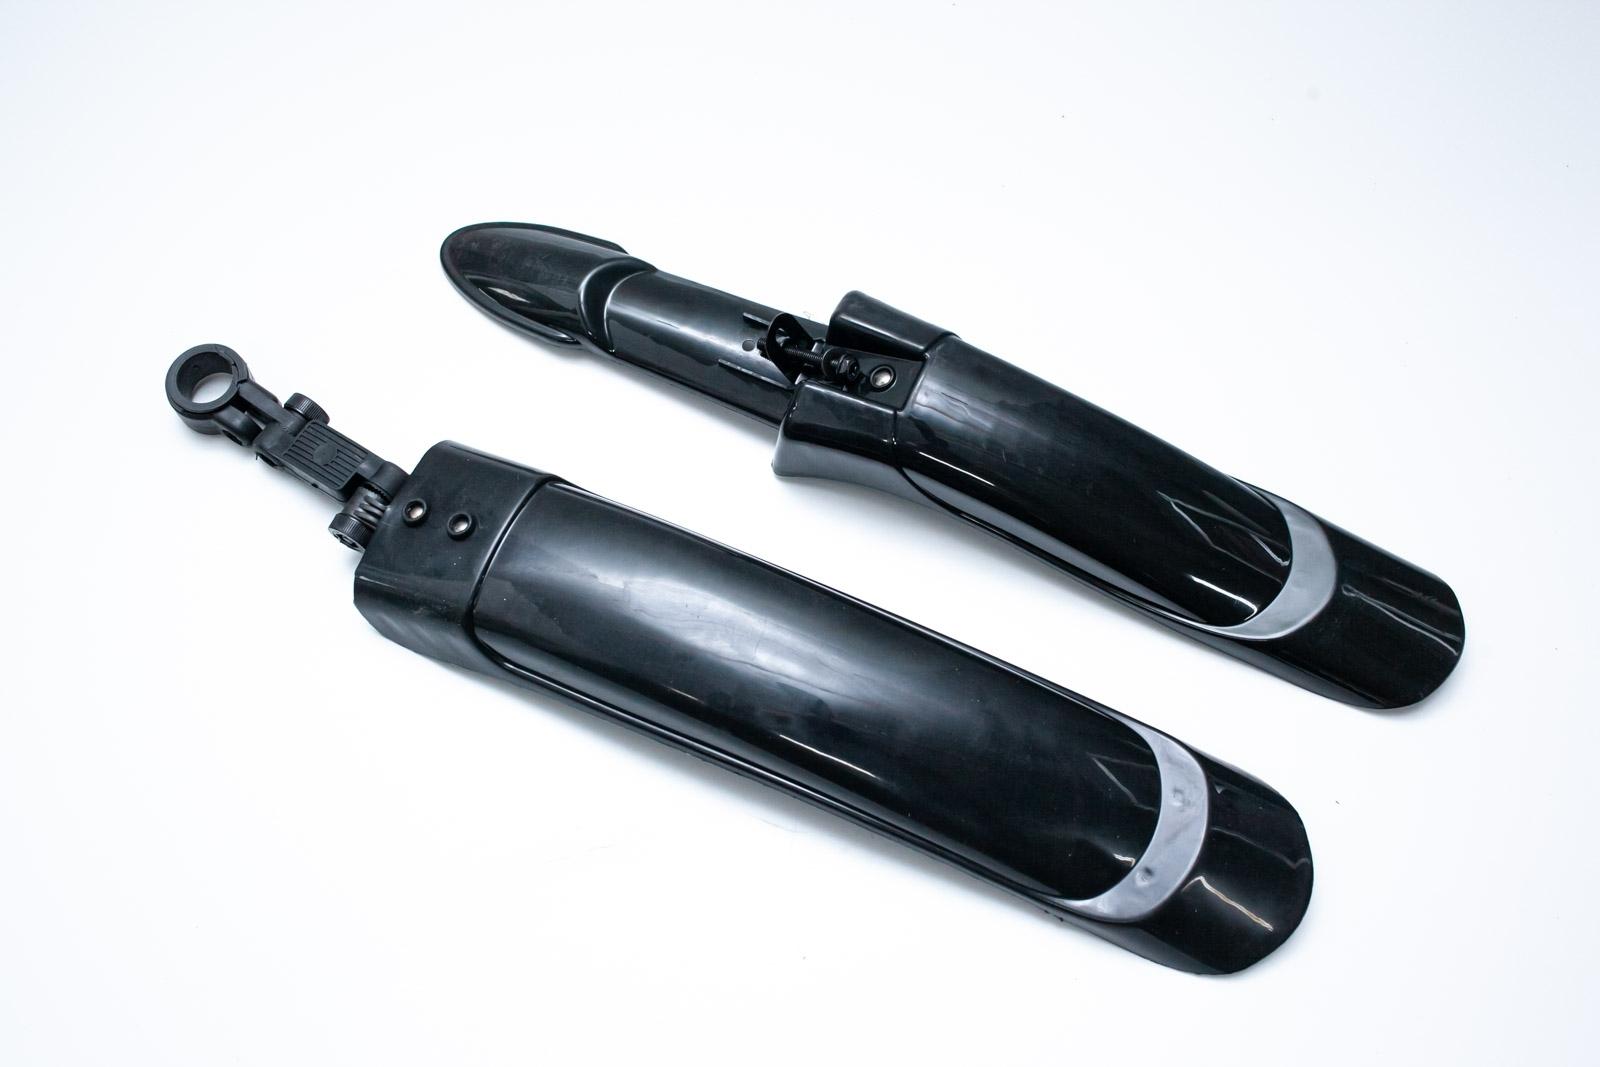 Фото Крыло 20-29″ Pl JT-007-1 пластиковый кронштейн (черн.)